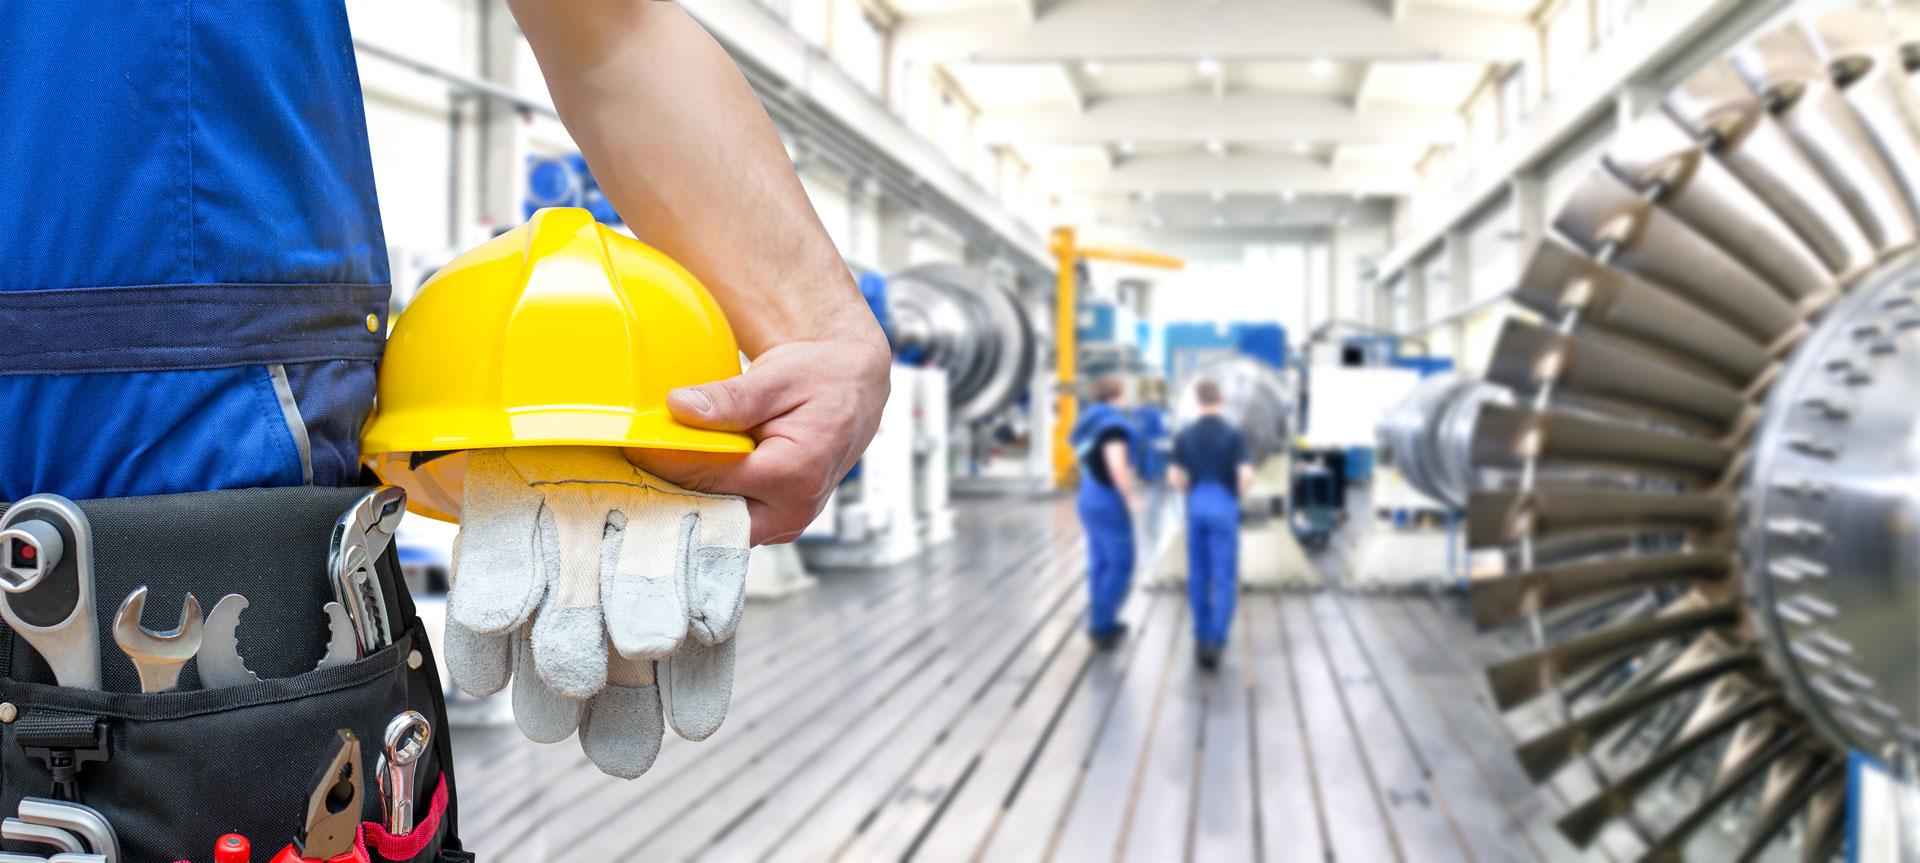 Manufacturing Engineering Career Scope in Pakistan Job Opportunities Guideline